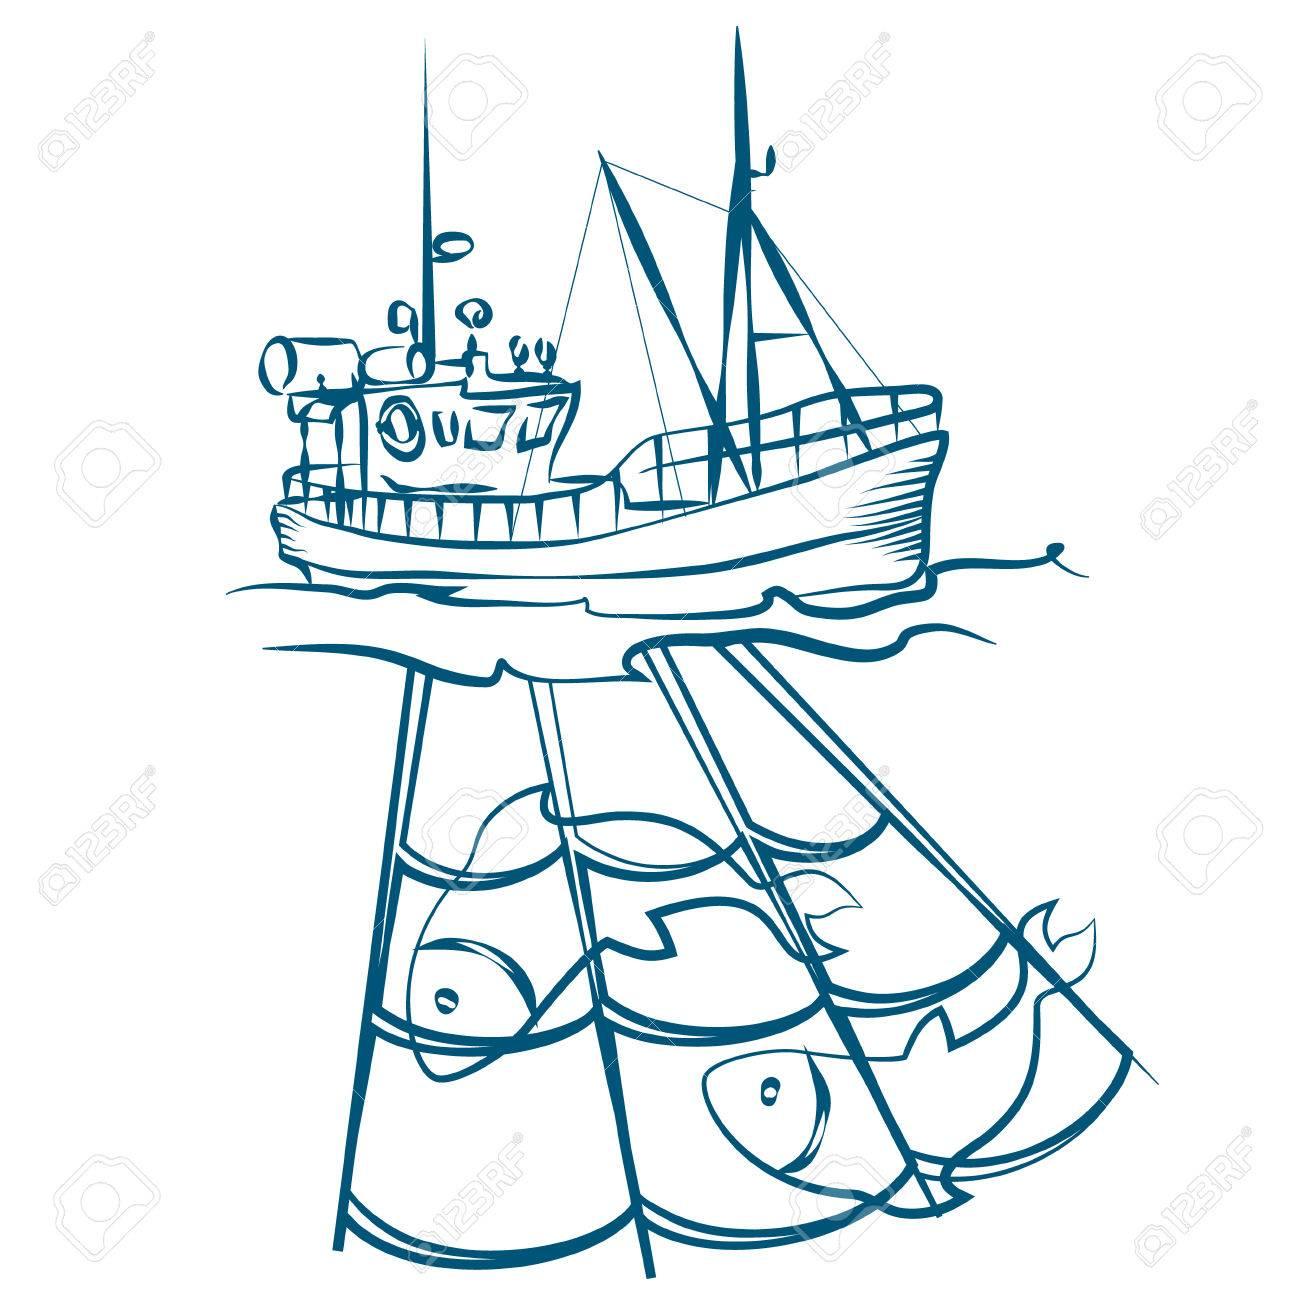 Fishing boat drawing at. Boats clipart line art